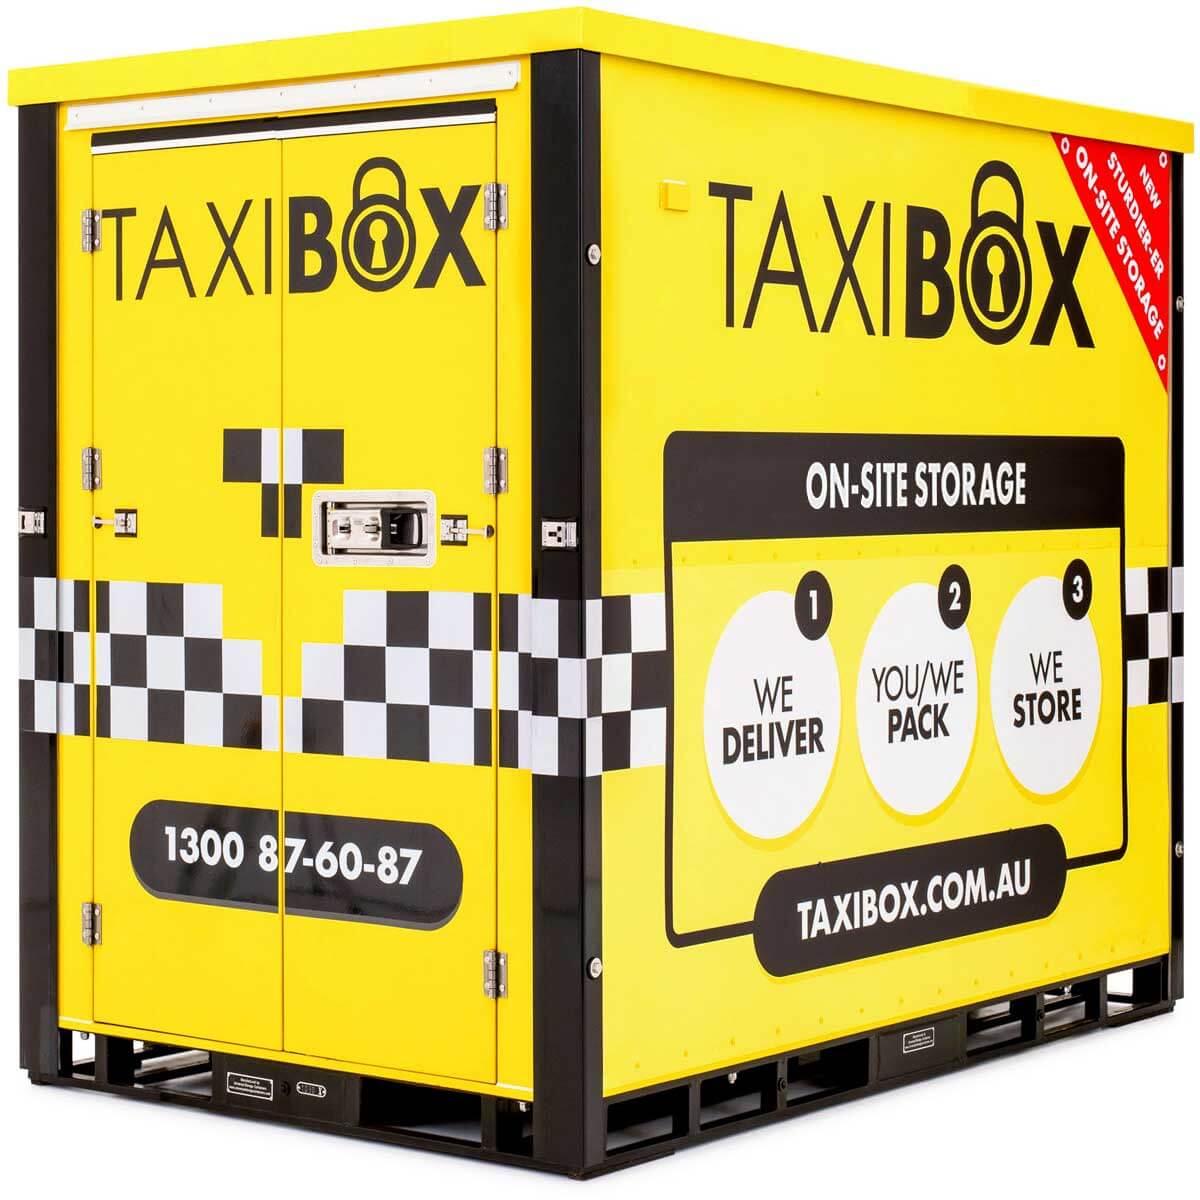 TAXIBOX On-site Storage